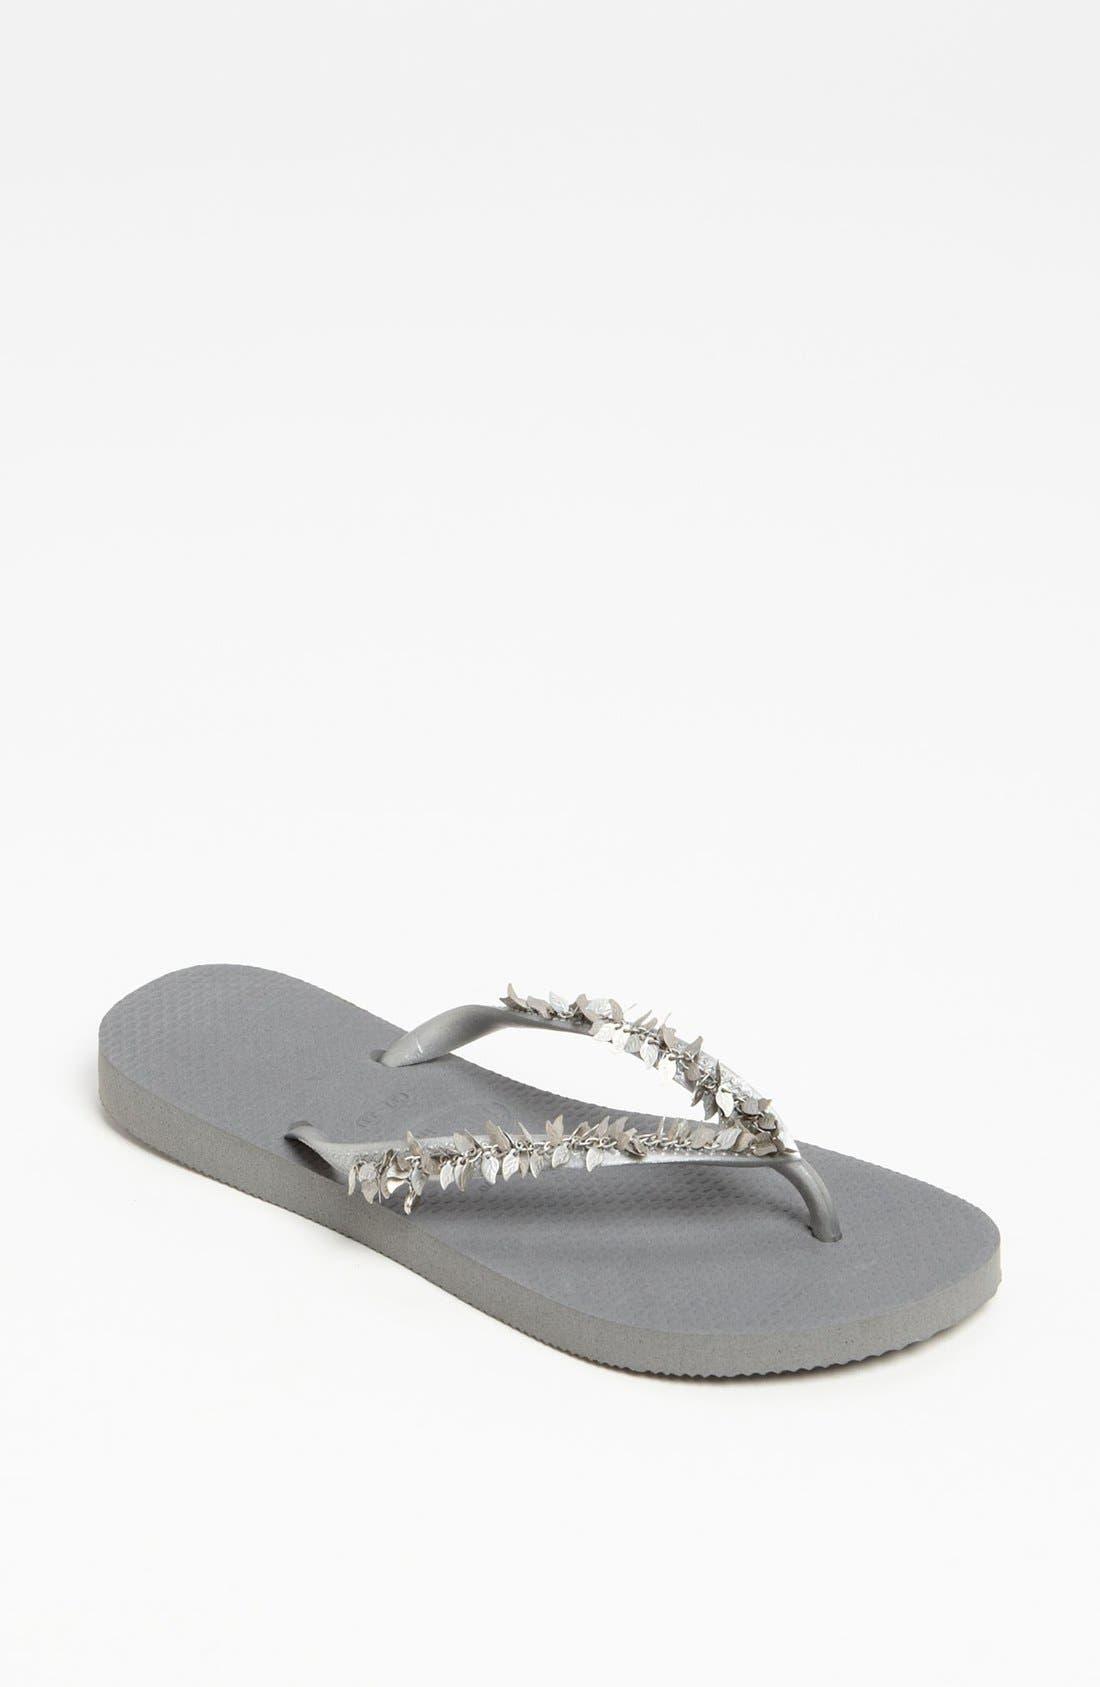 Alternate Image 1 Selected - Havaianas 'Slim Leaves' Sandal (Women)